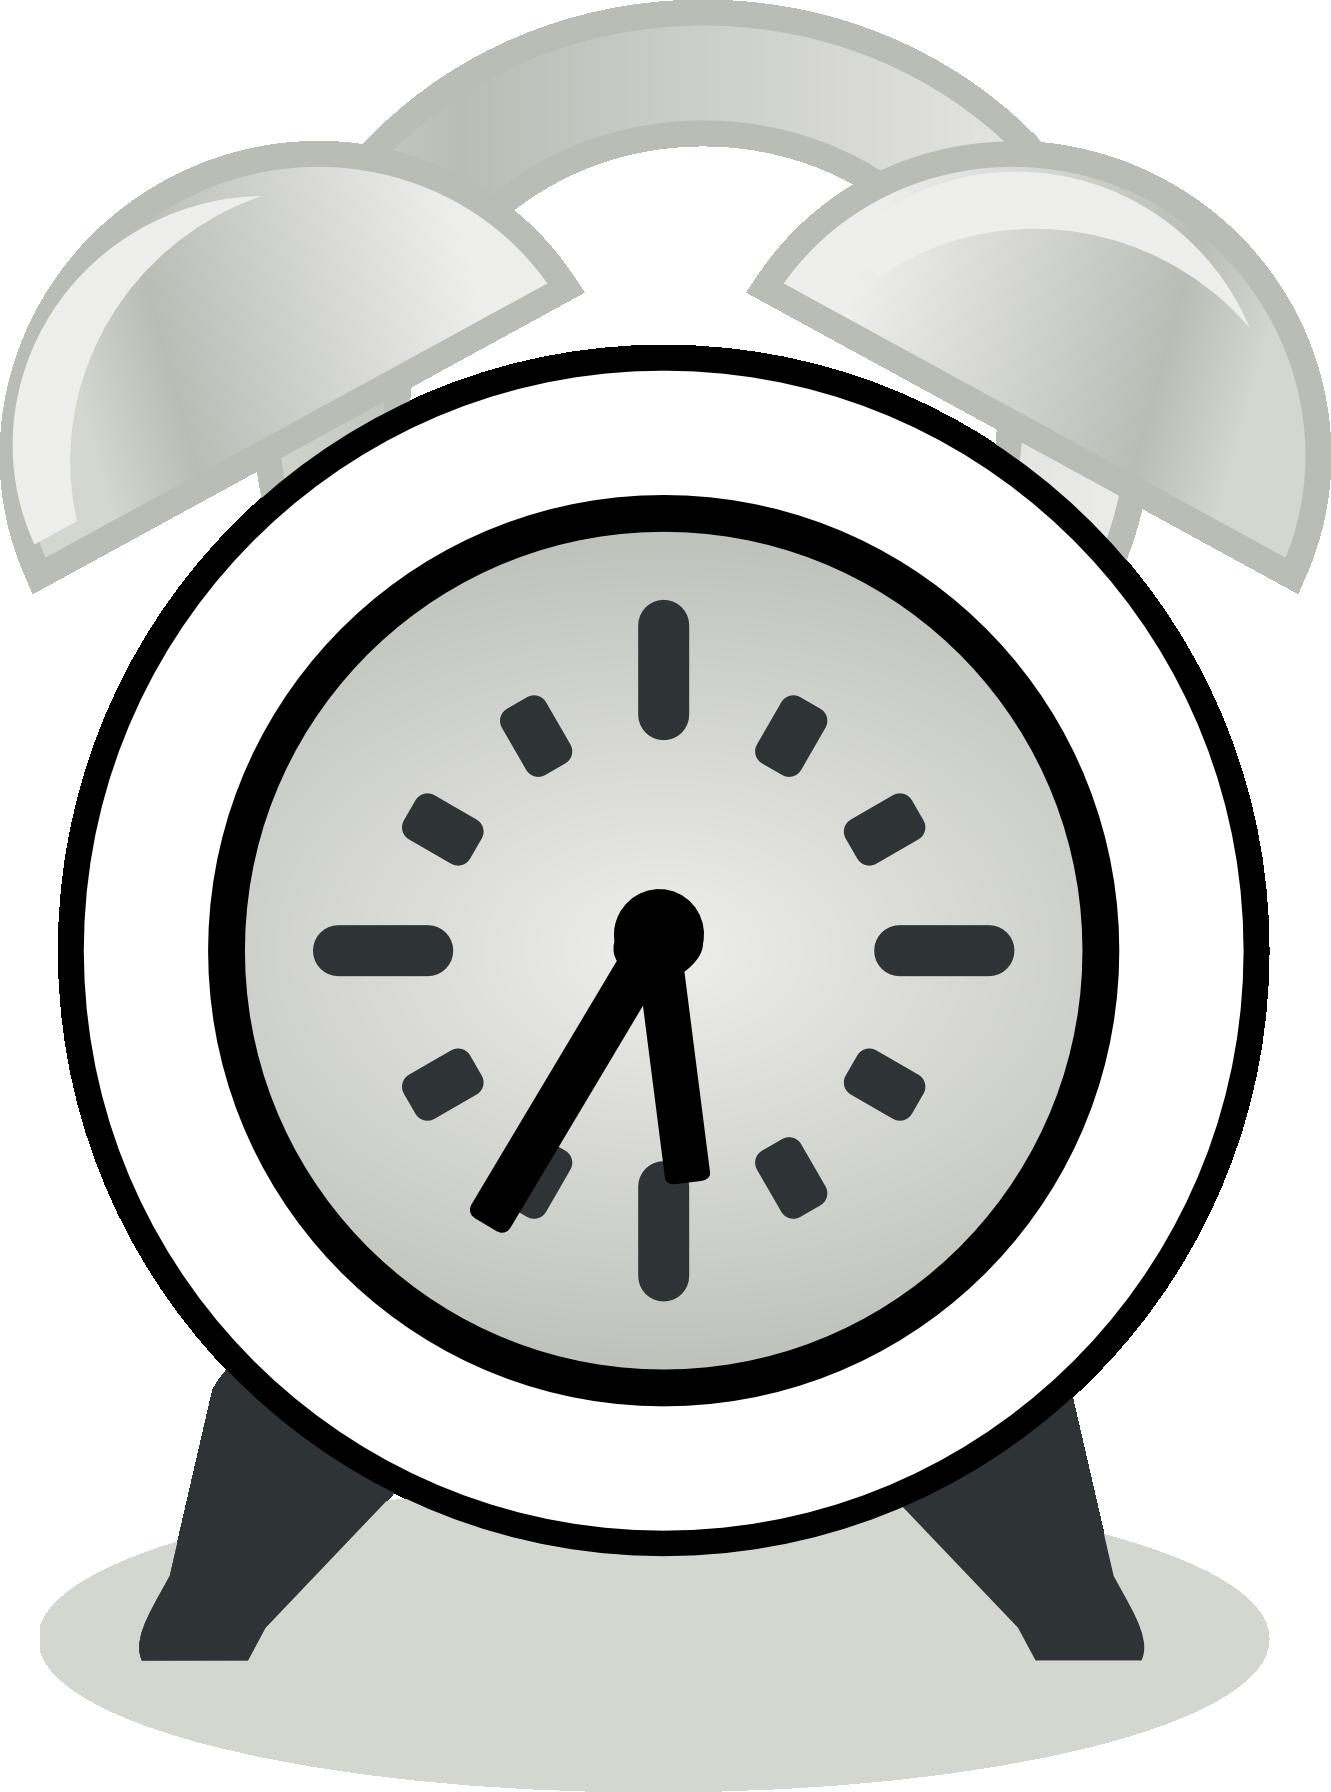 Car alarm clipart royalty free stock Car Alarm Clock Clipart royalty free stock